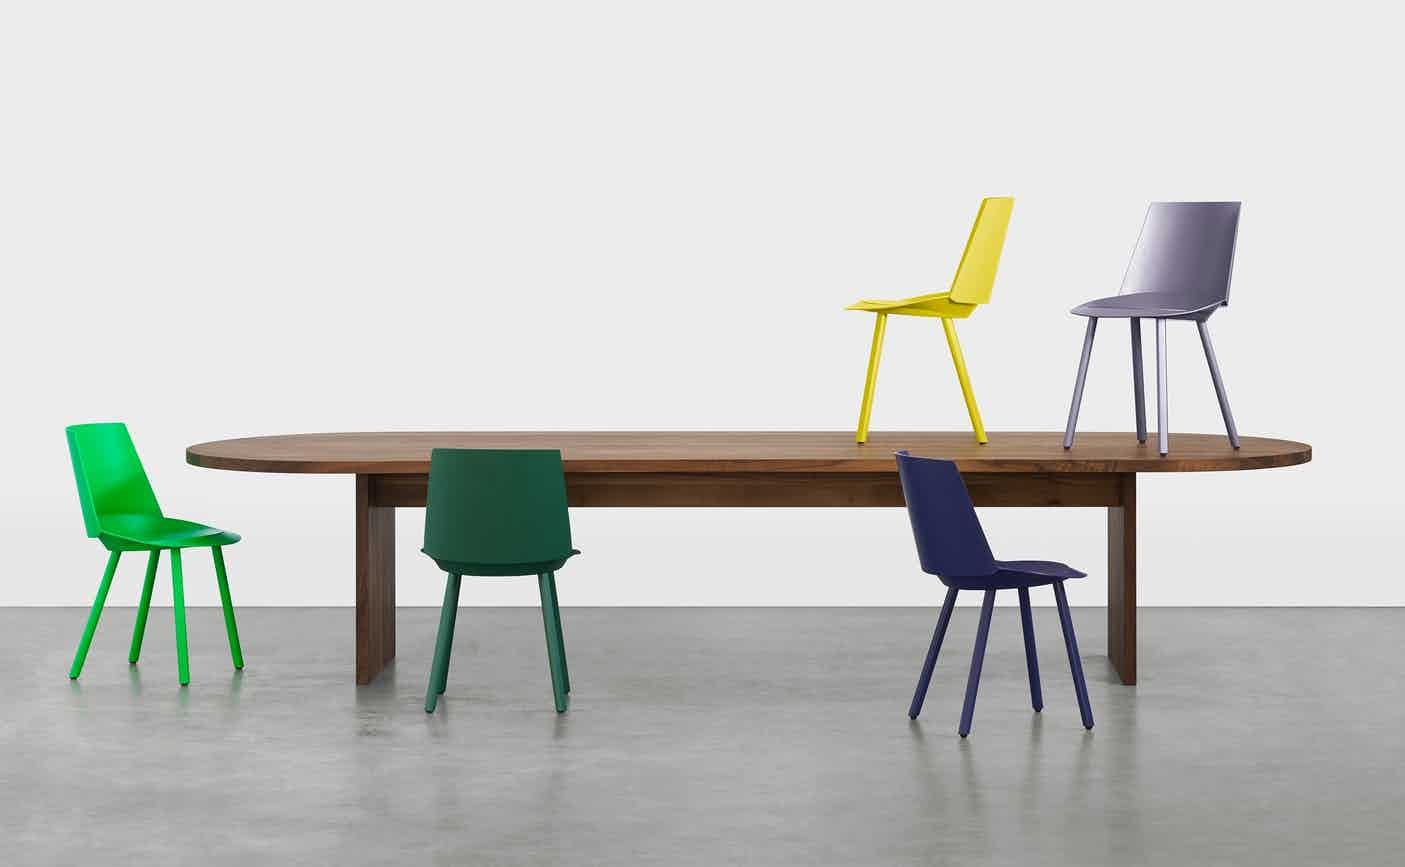 E15-furniture-ashida-table-multi-chairs-haute-living